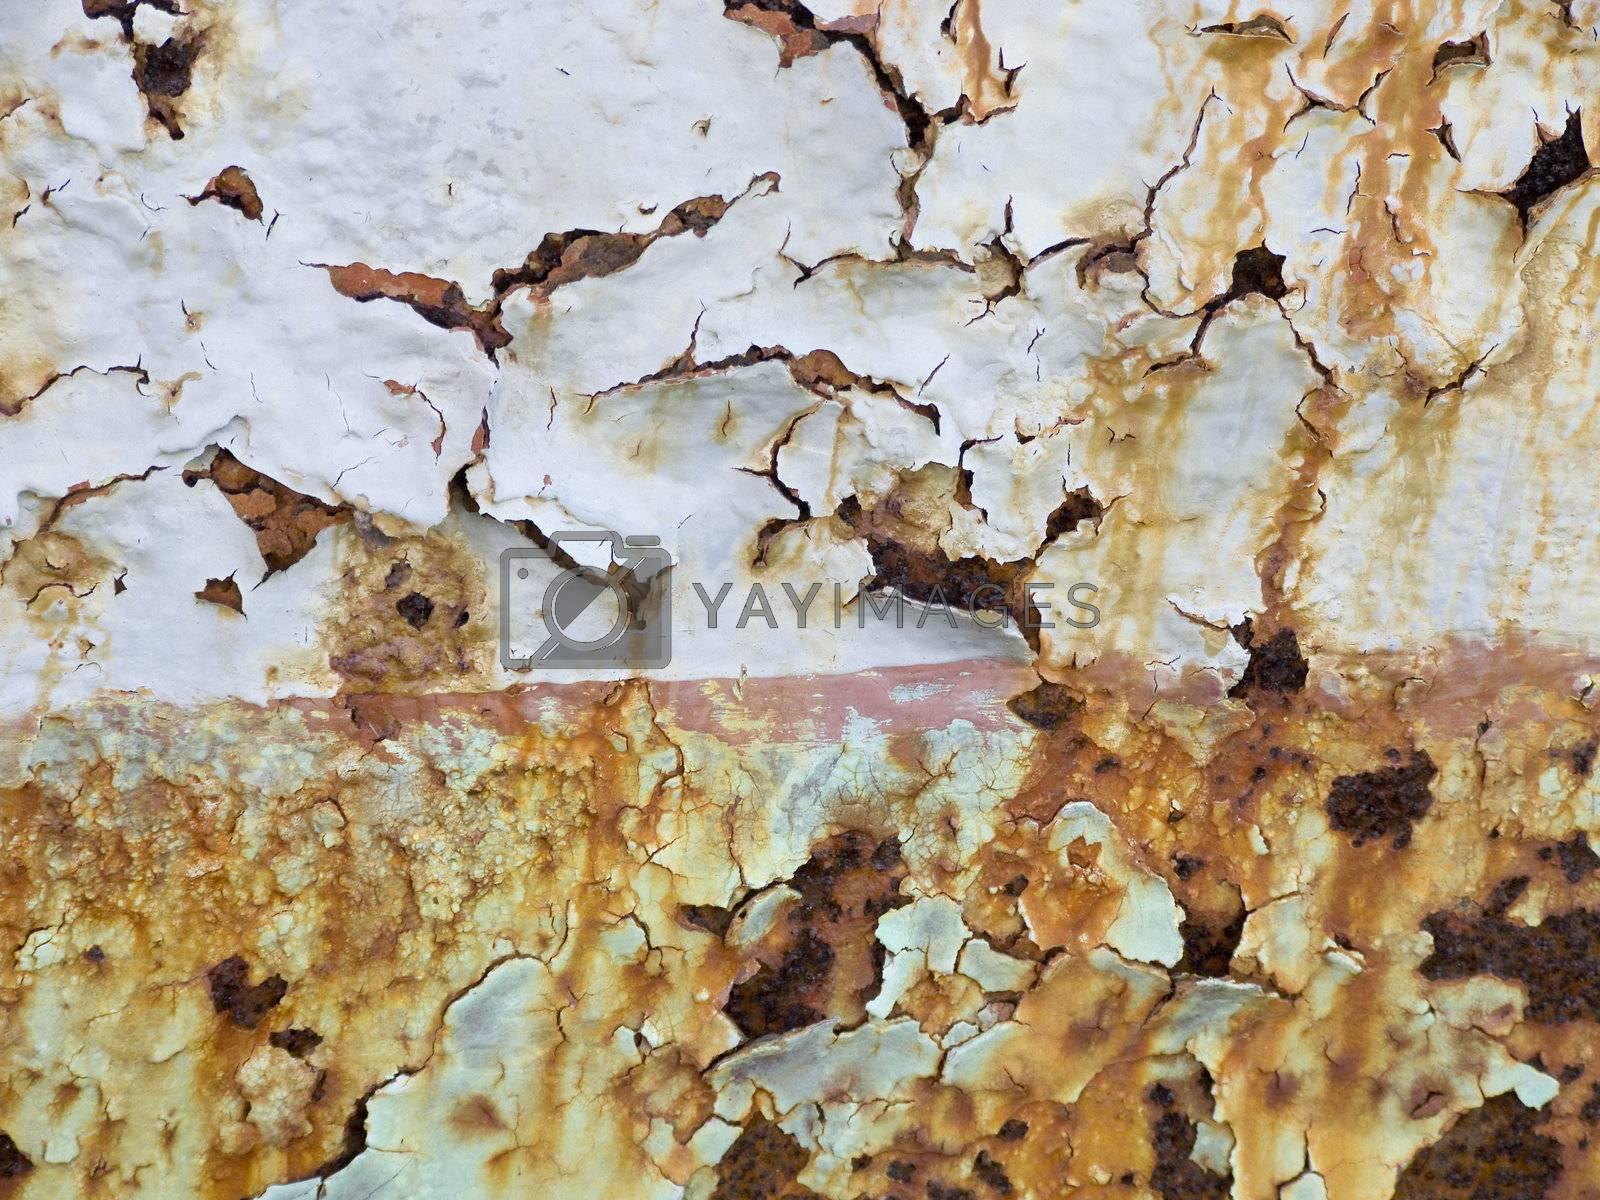 Grunge rusty background by PauloResende